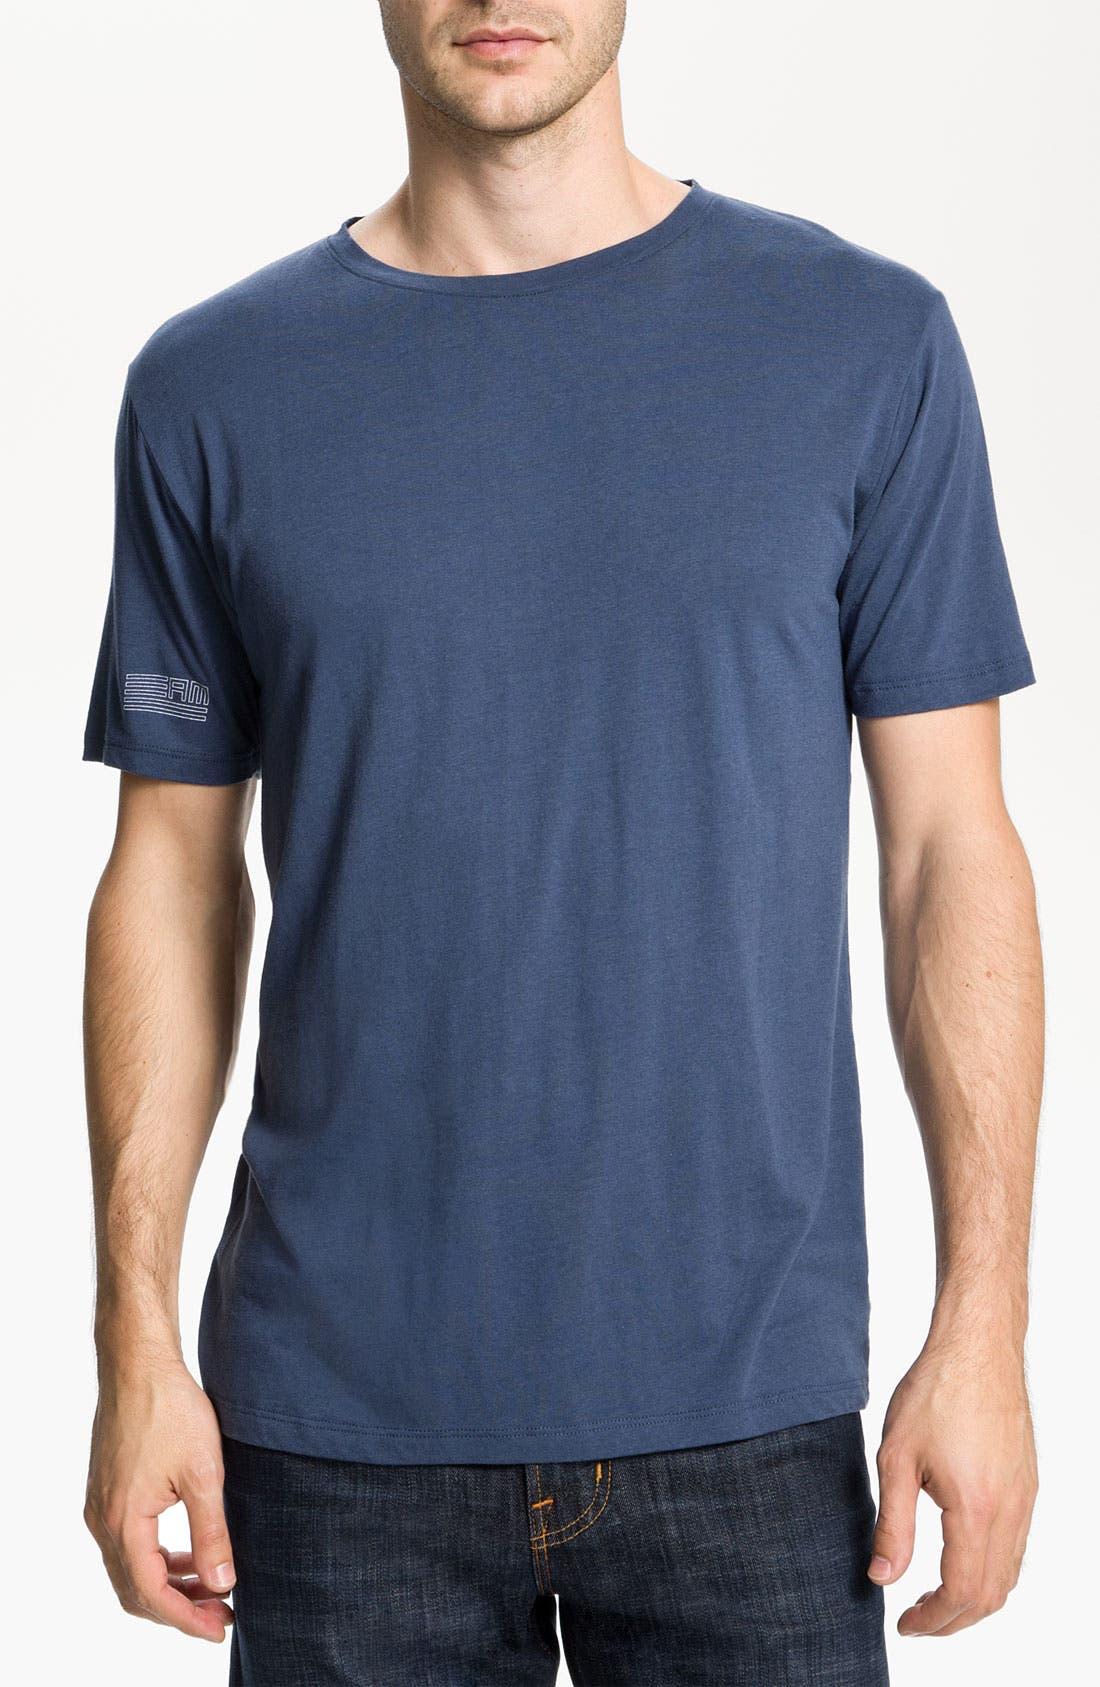 Alternate Image 1 Selected - Alex Maine 'Premium' Crewneck T-Shirt